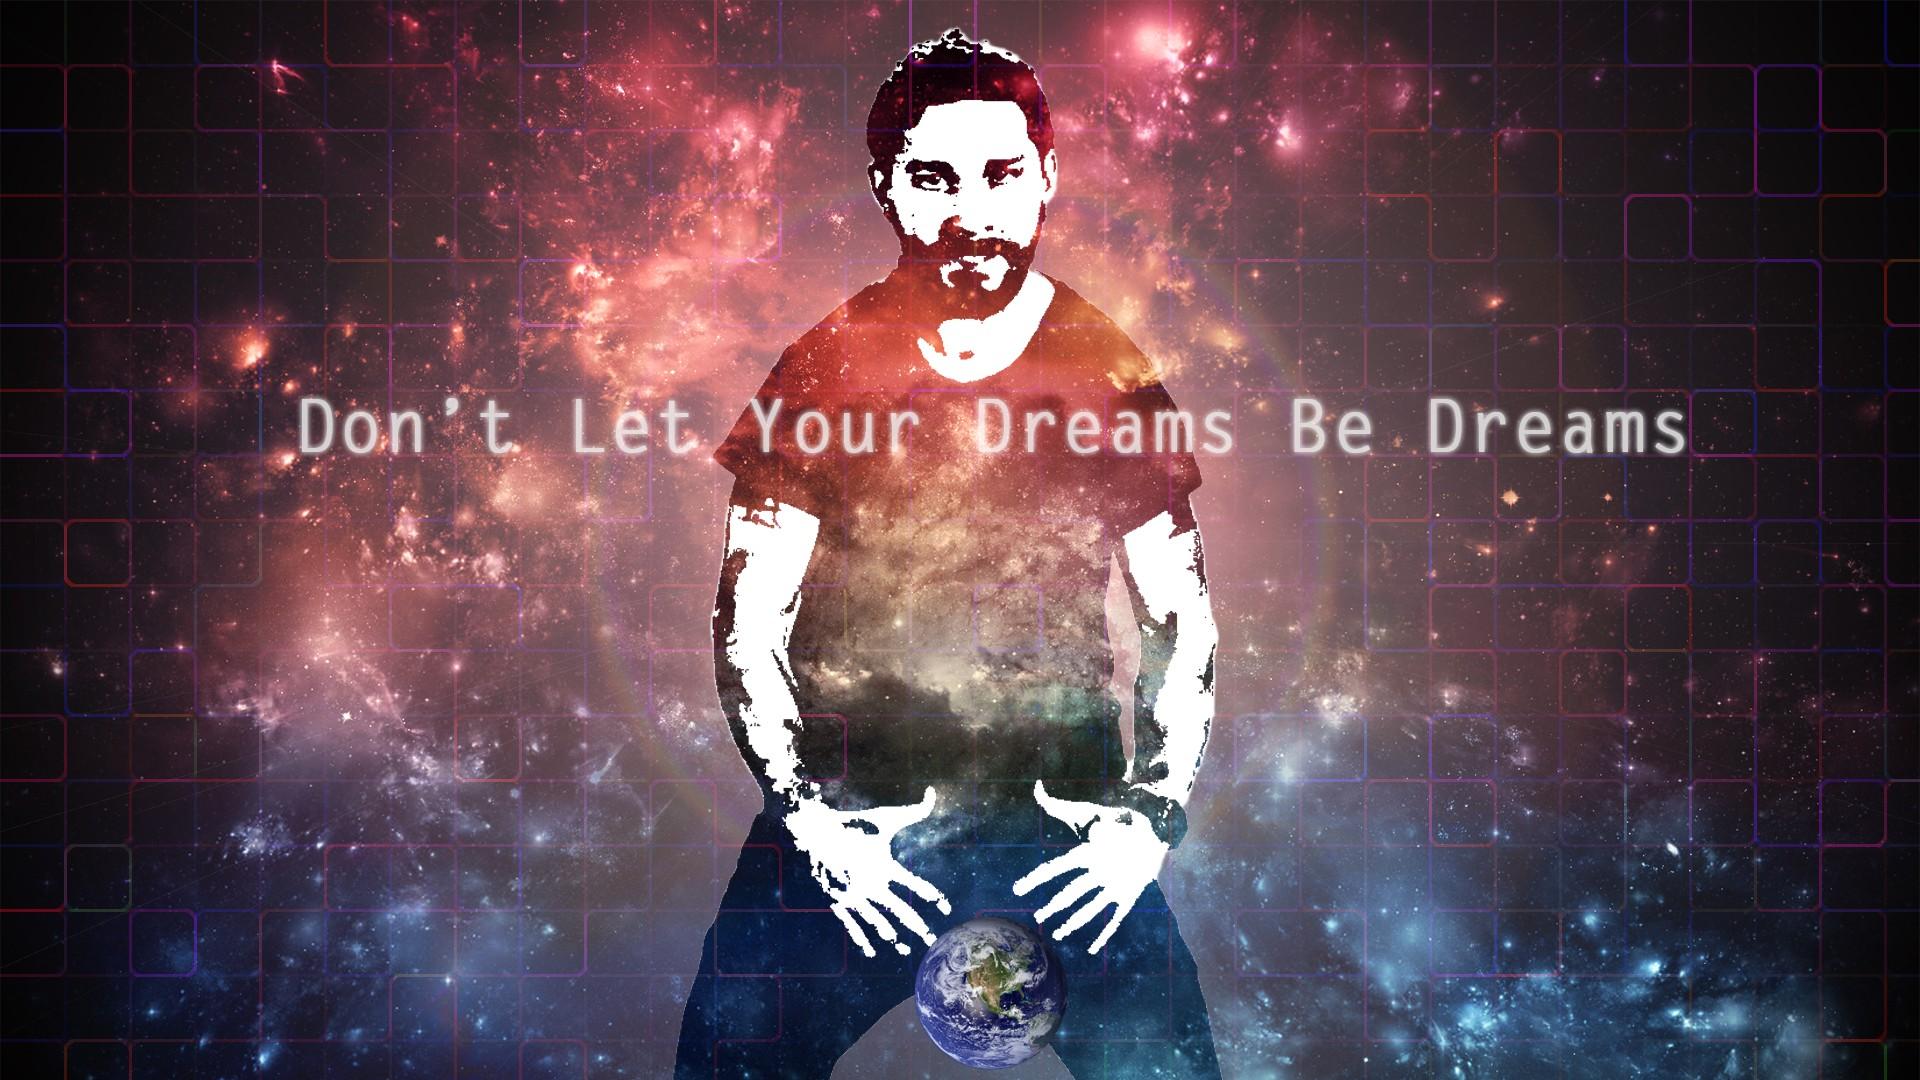 Actor Motivational Memes Poster Shia LaBeouf Screenshot Computer Wallpaper Album Cover